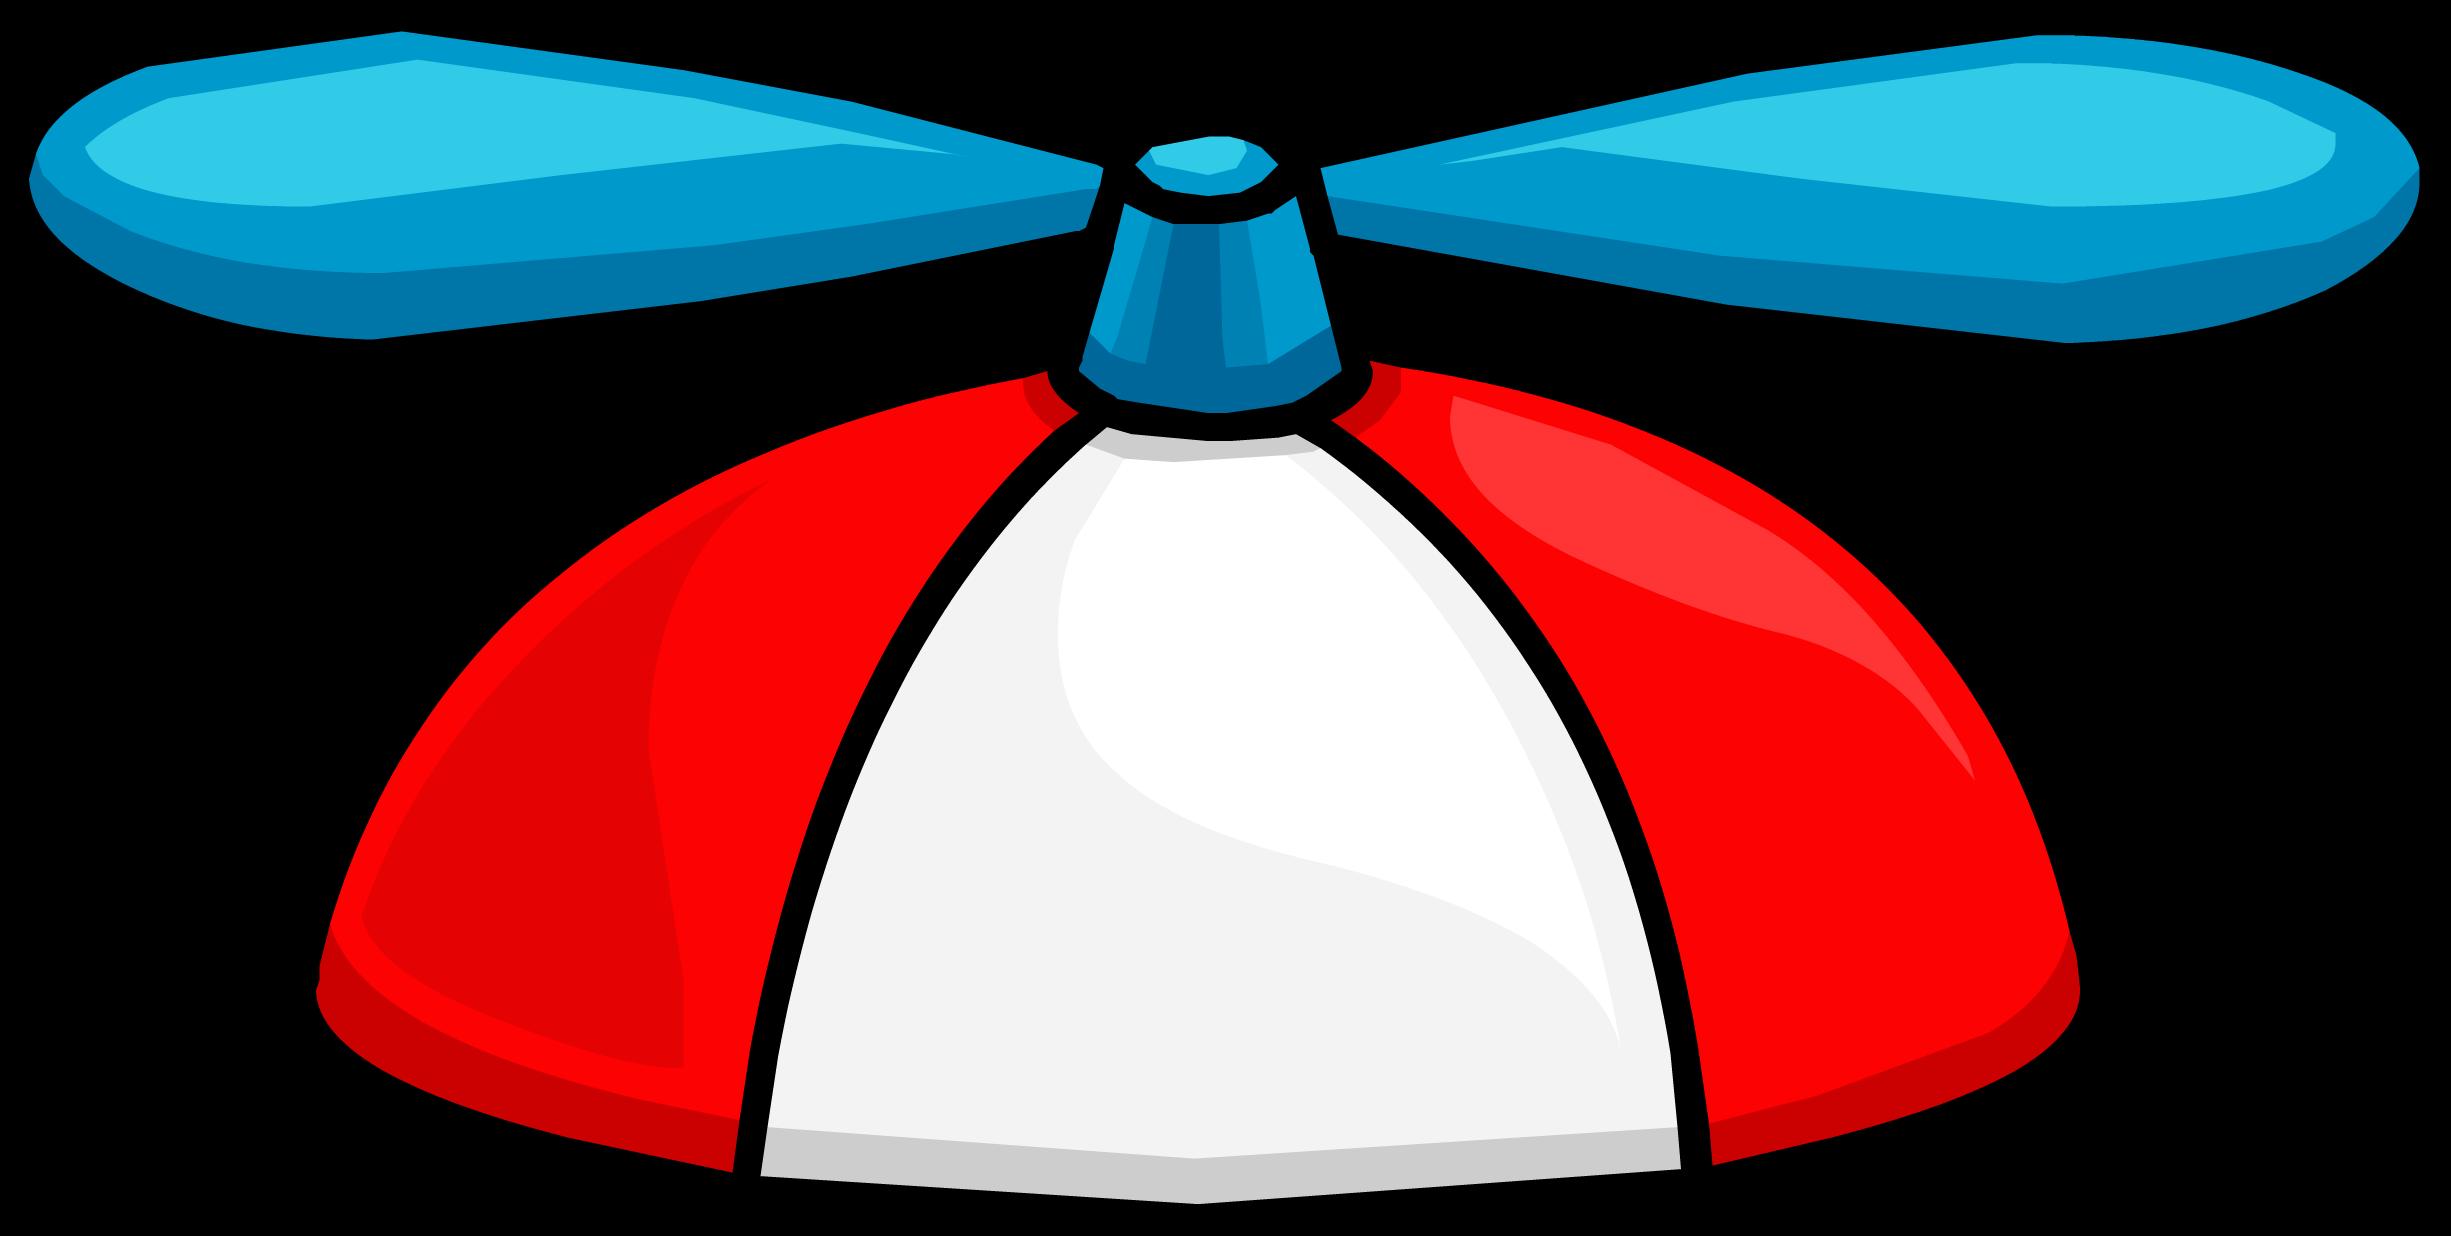 Score Tuffcat's Spinny Hat by merkinspurlock on Threadless